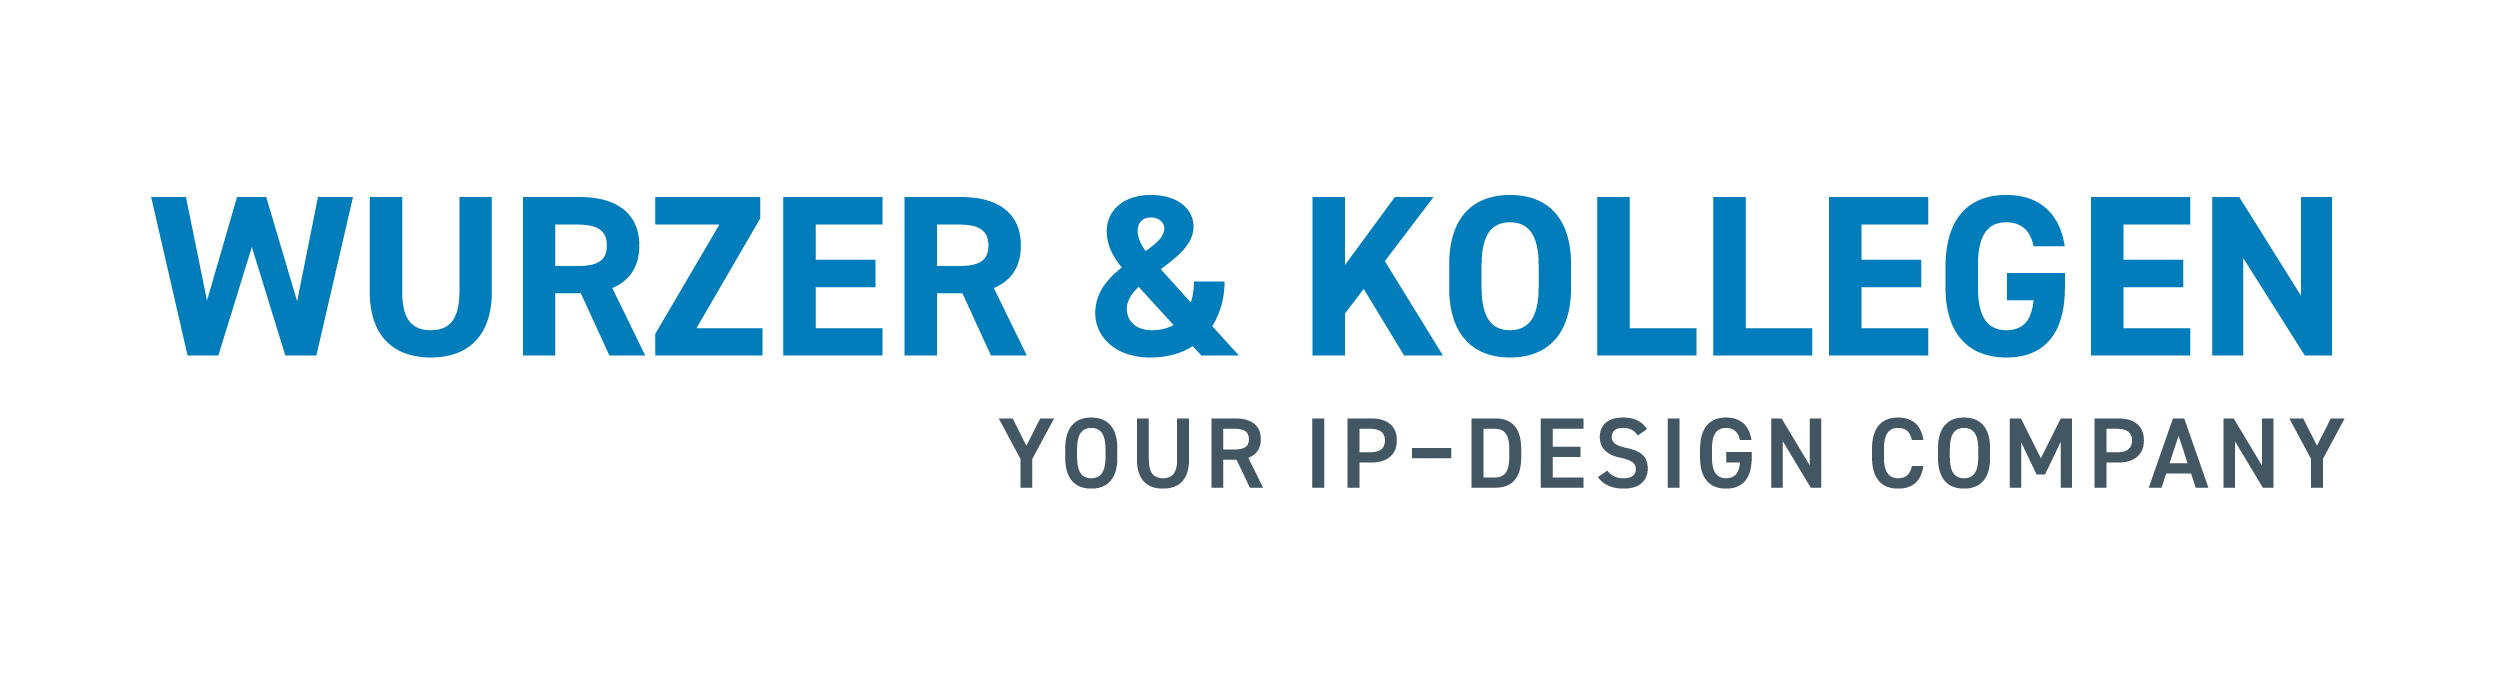 Wurzer & Kollegen | your ip design company